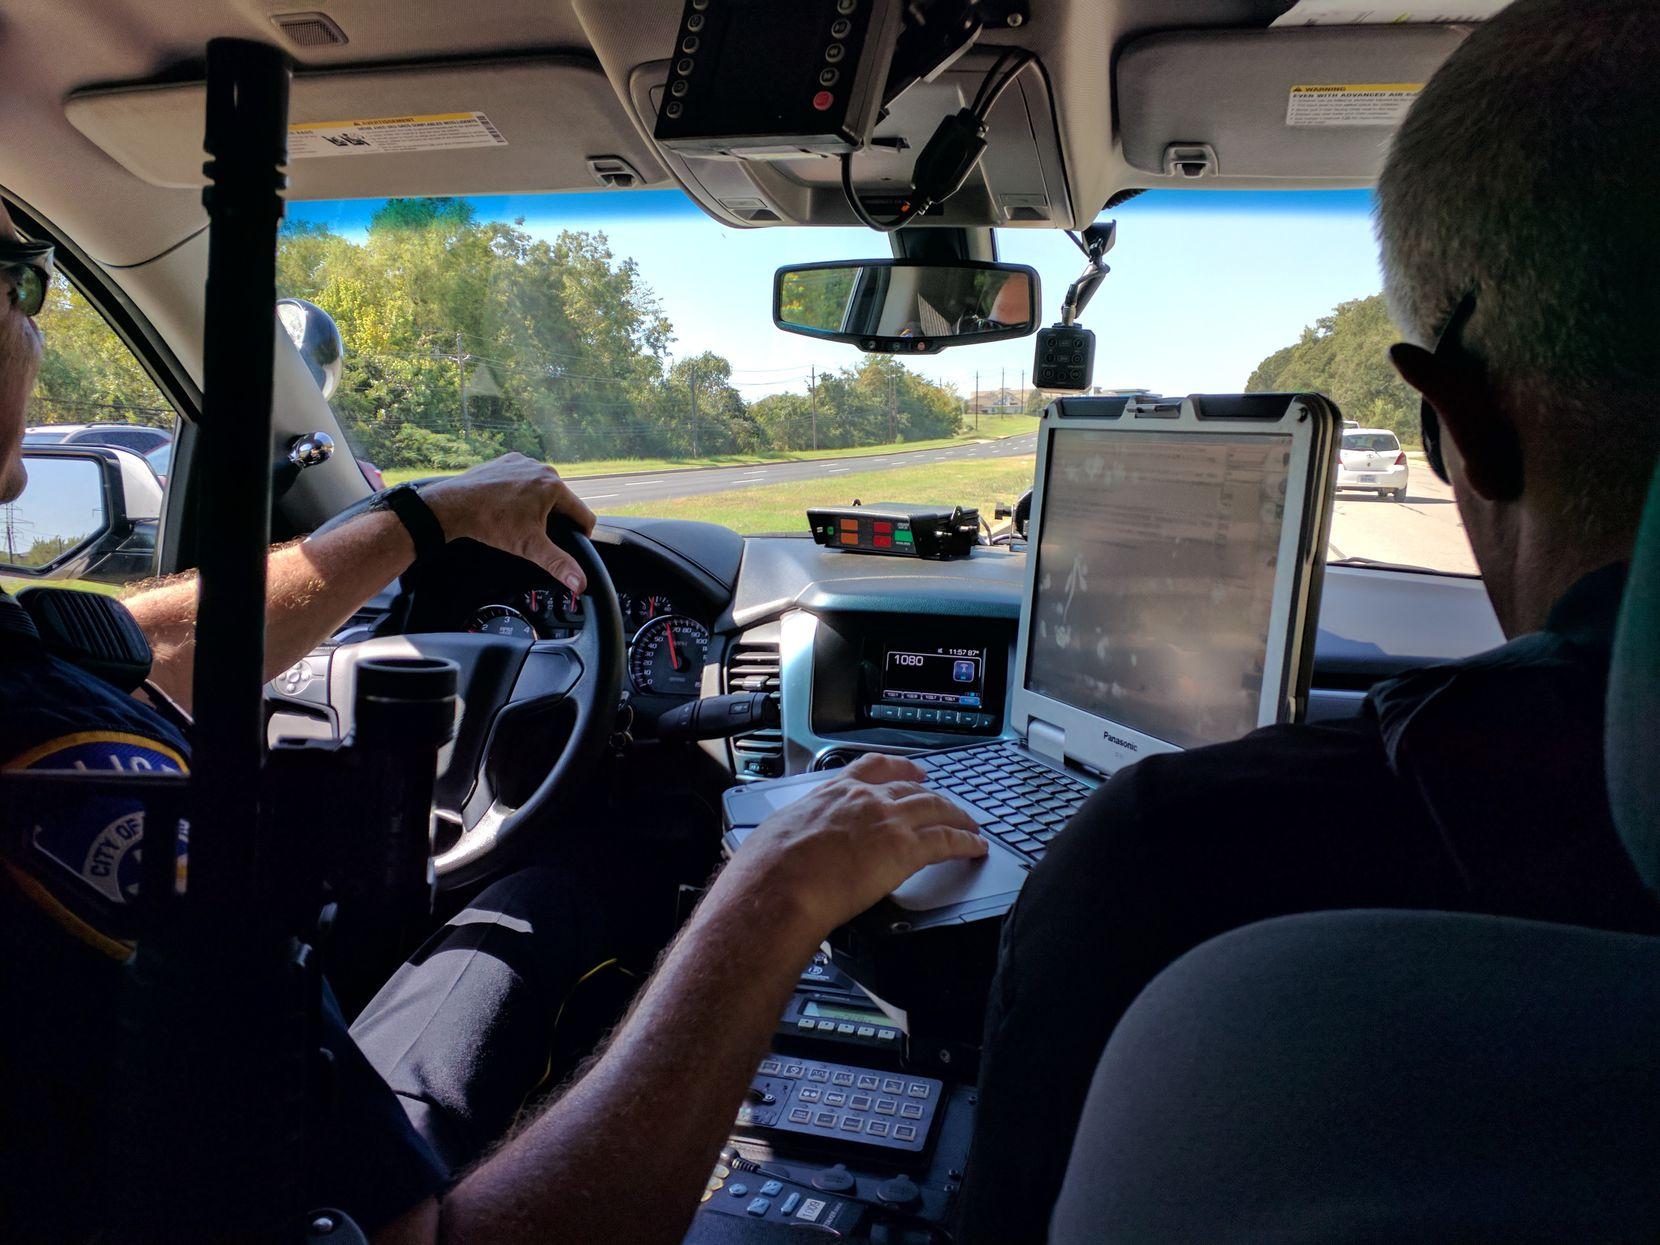 Officer Casey Sanders (left) and BIU Mental Health Coordinator Ken Bennett patrol a neighborhood in Euless in the Euless Police Department patrol car.